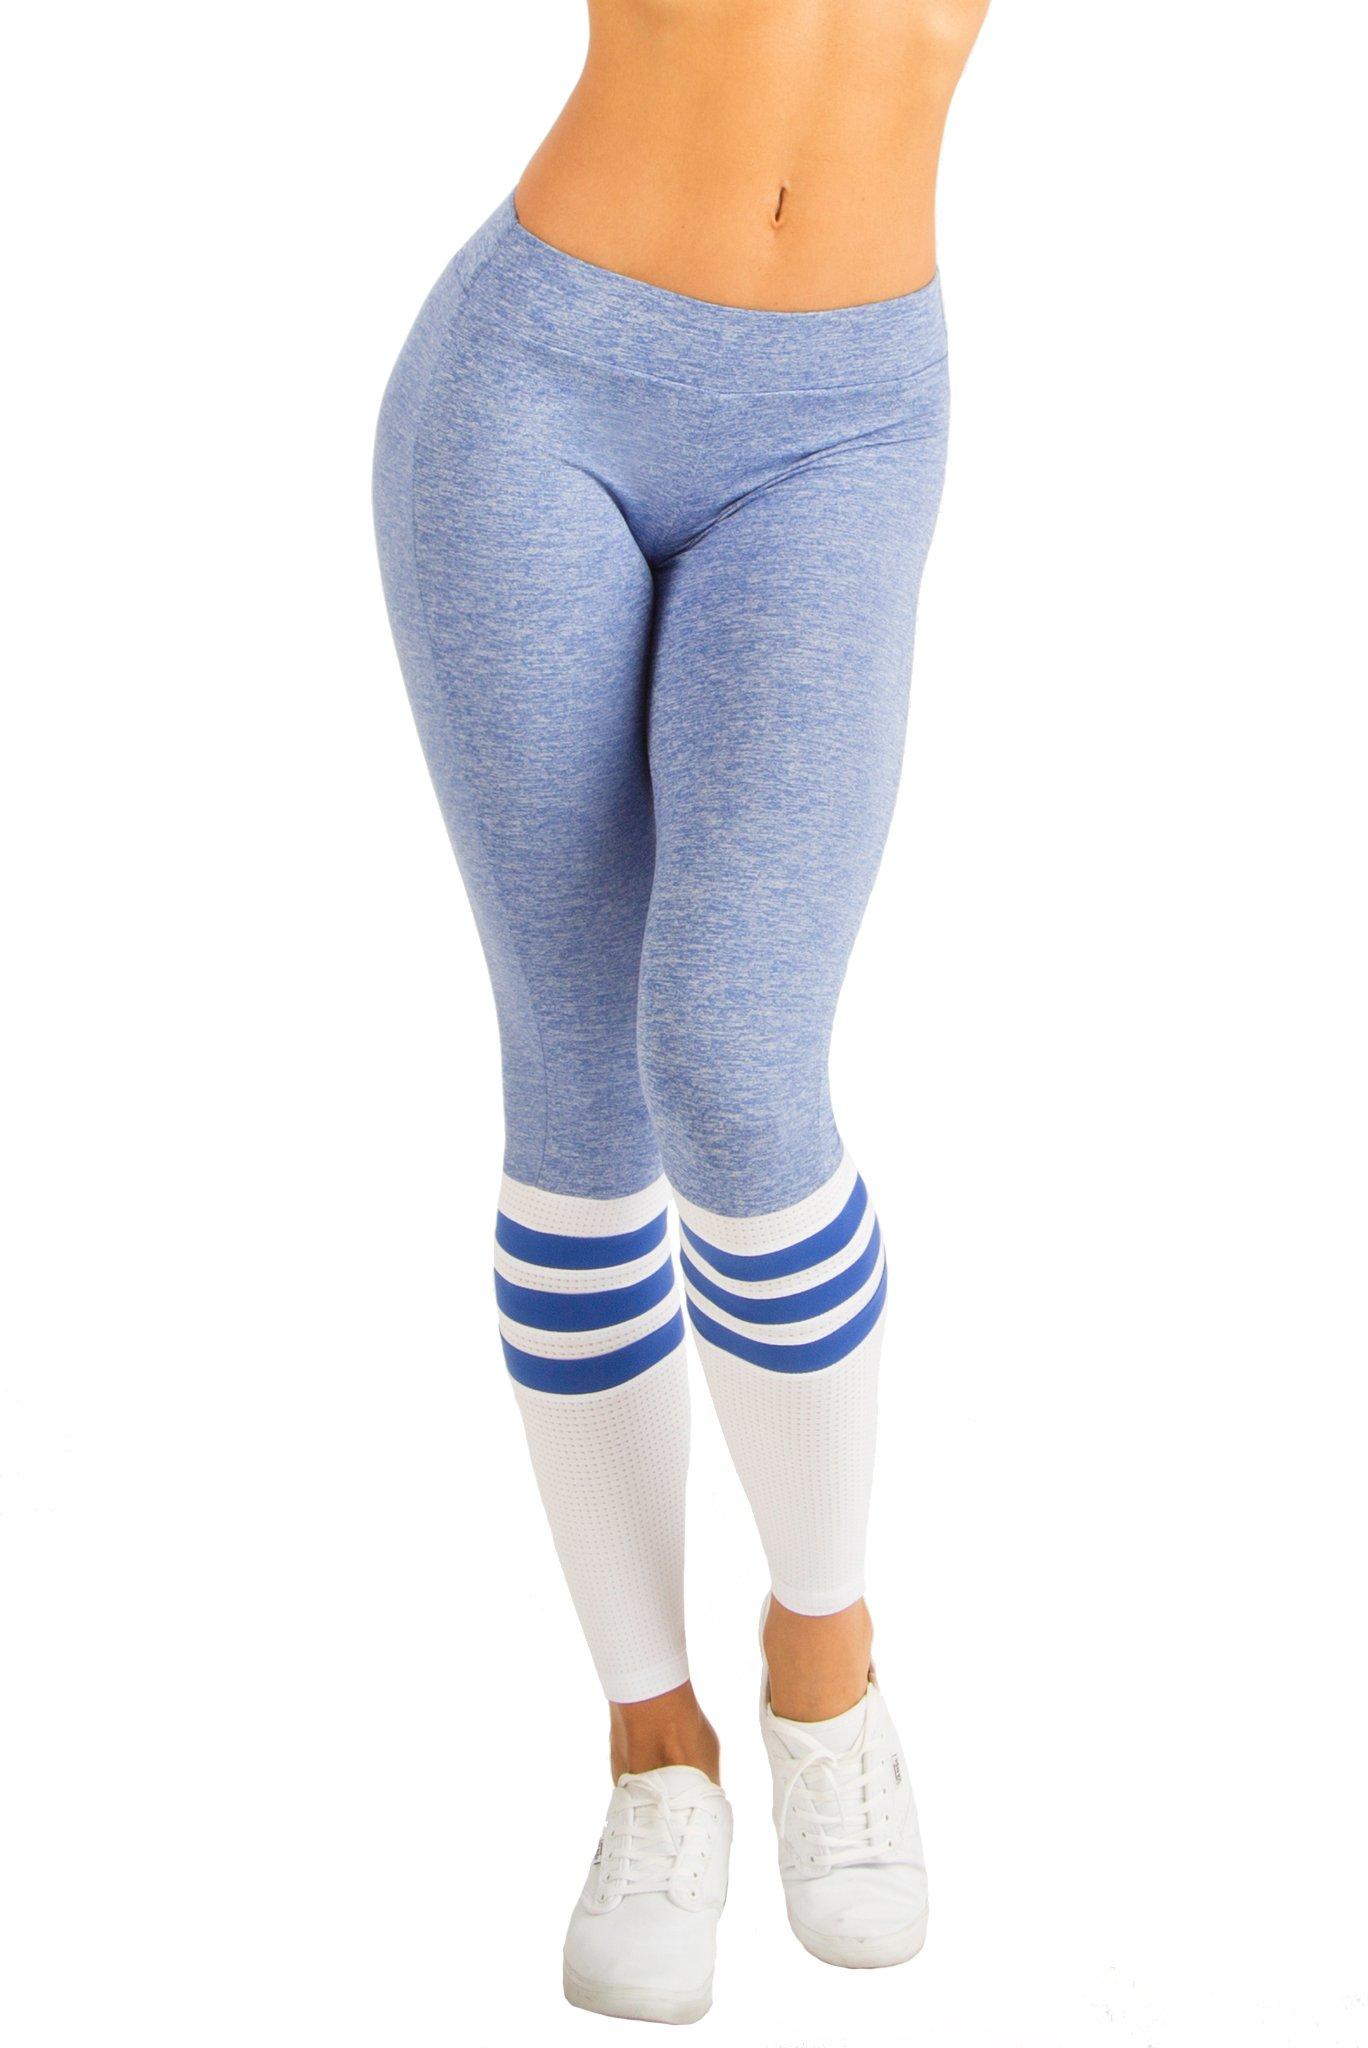 Bombshell Sportswear - Sock Leggings (Blue, Small)